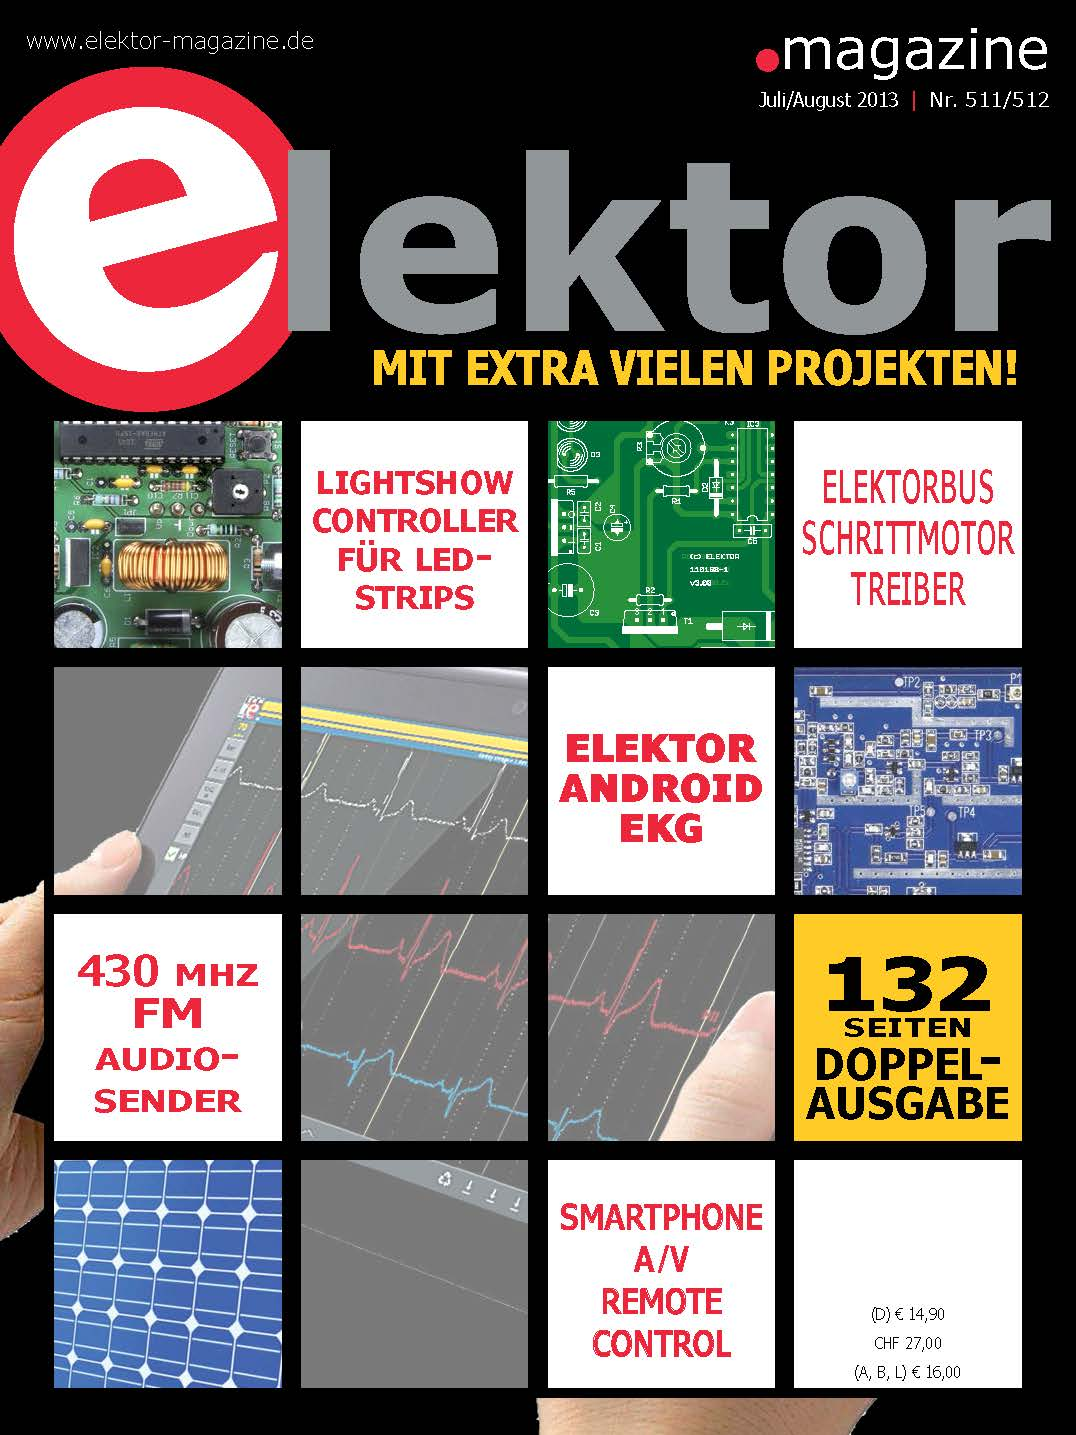 Elektor Magazine №7-8 2013 (Ger)